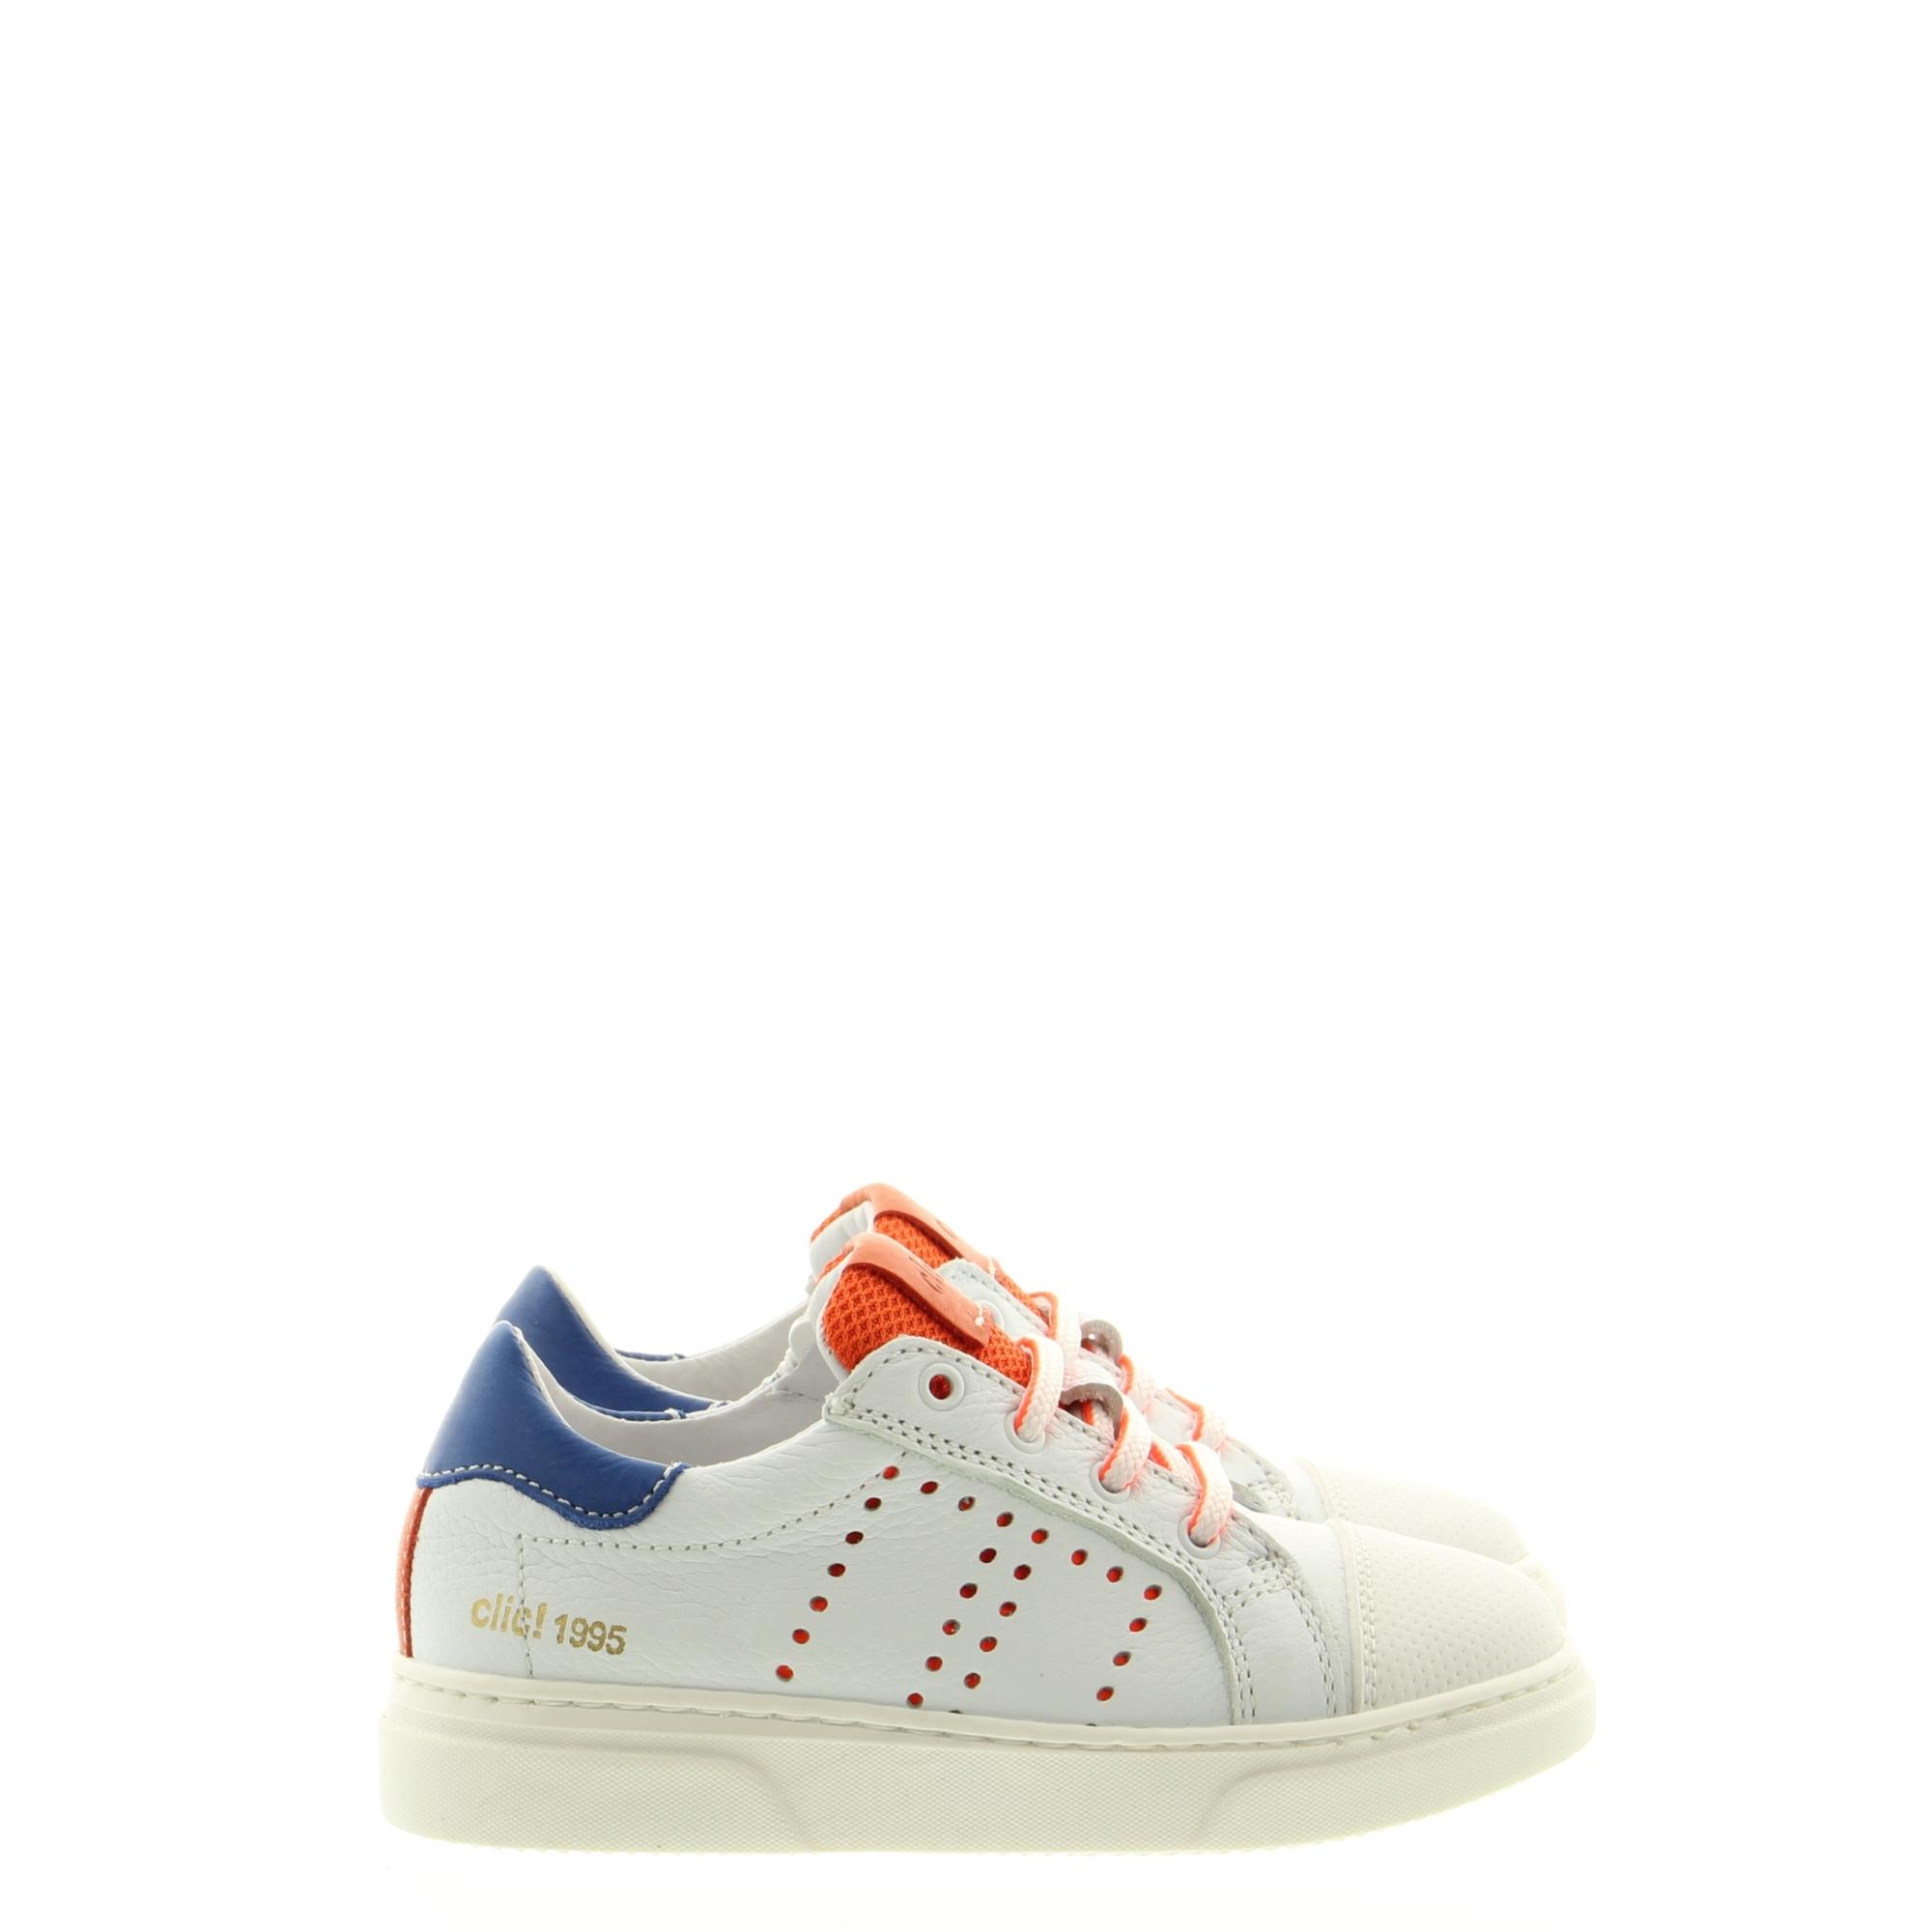 Clic 9798 Blanco Idem Naranja Zucca